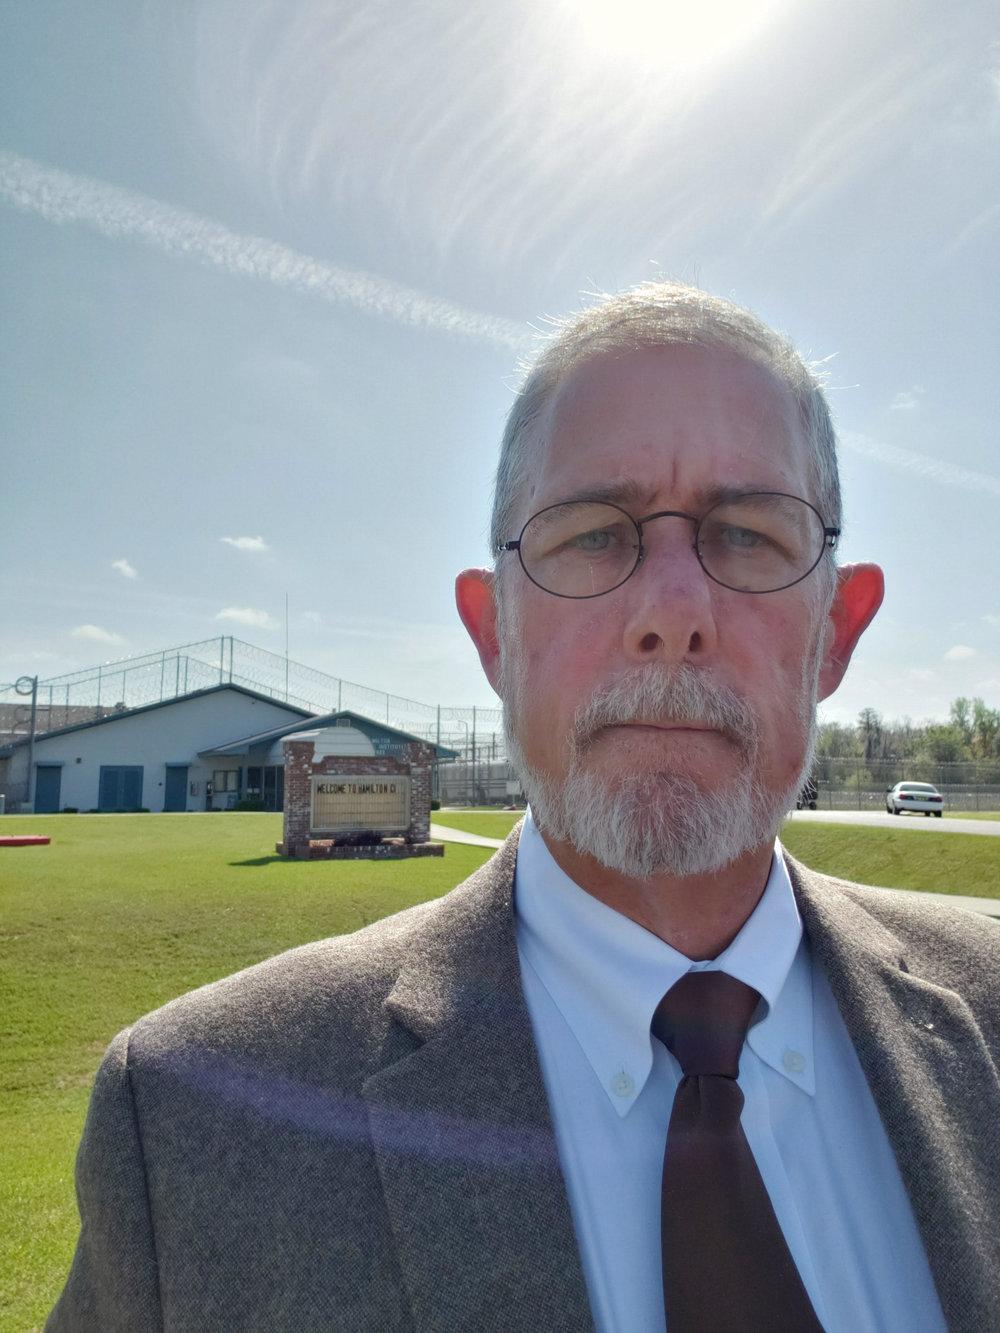 Criminal Defense Attorney Dan Daly